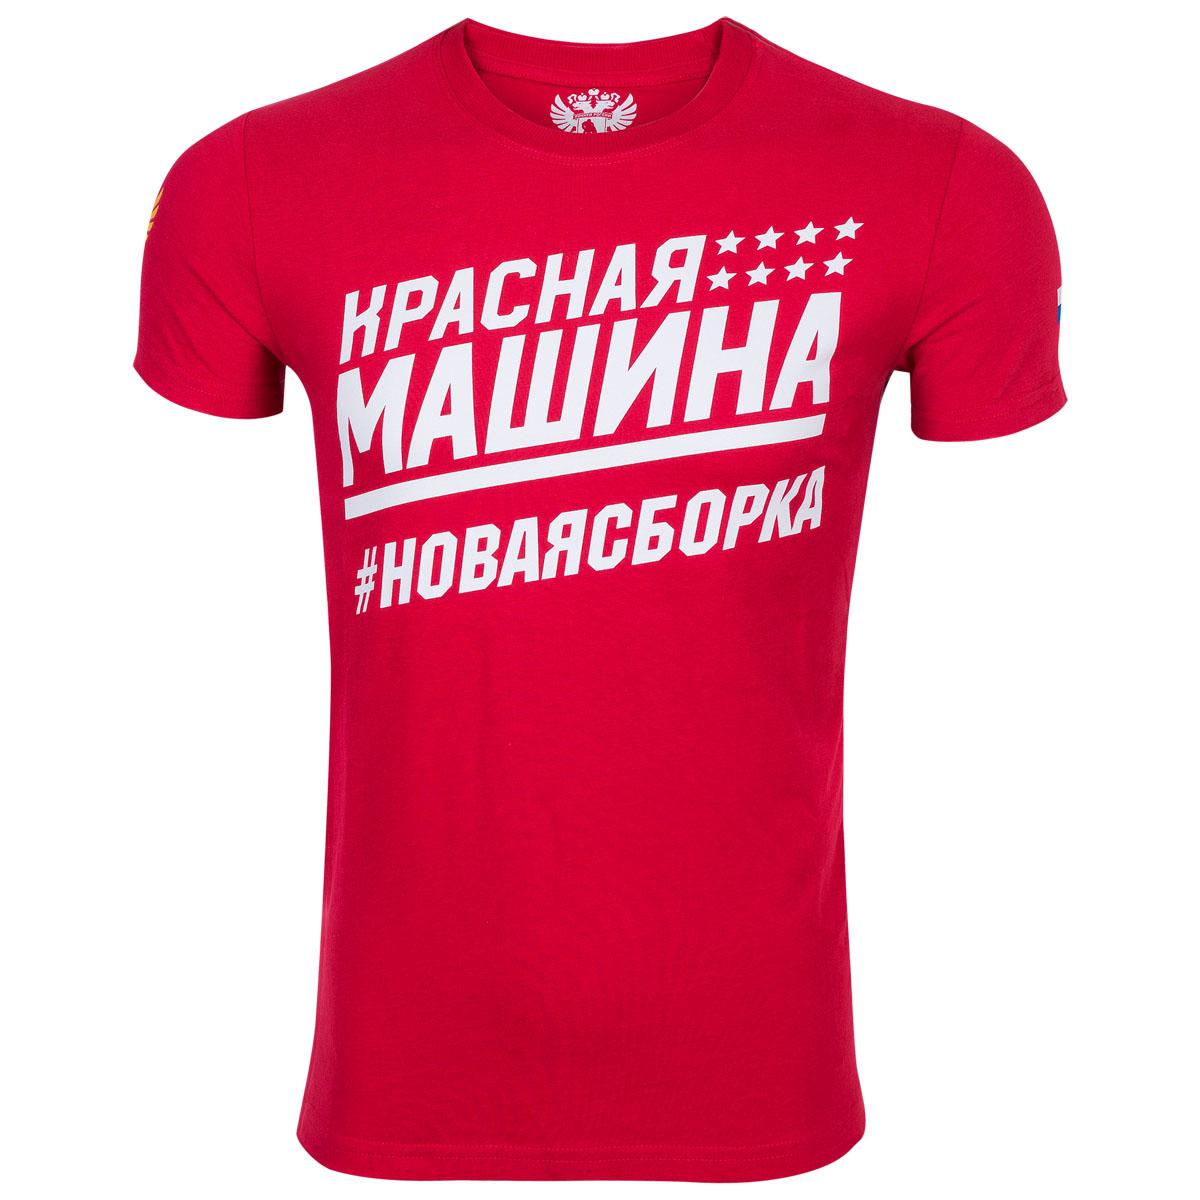 Футболка женская Красная Машина, цвет: красный. 65160050. Размер S (44)